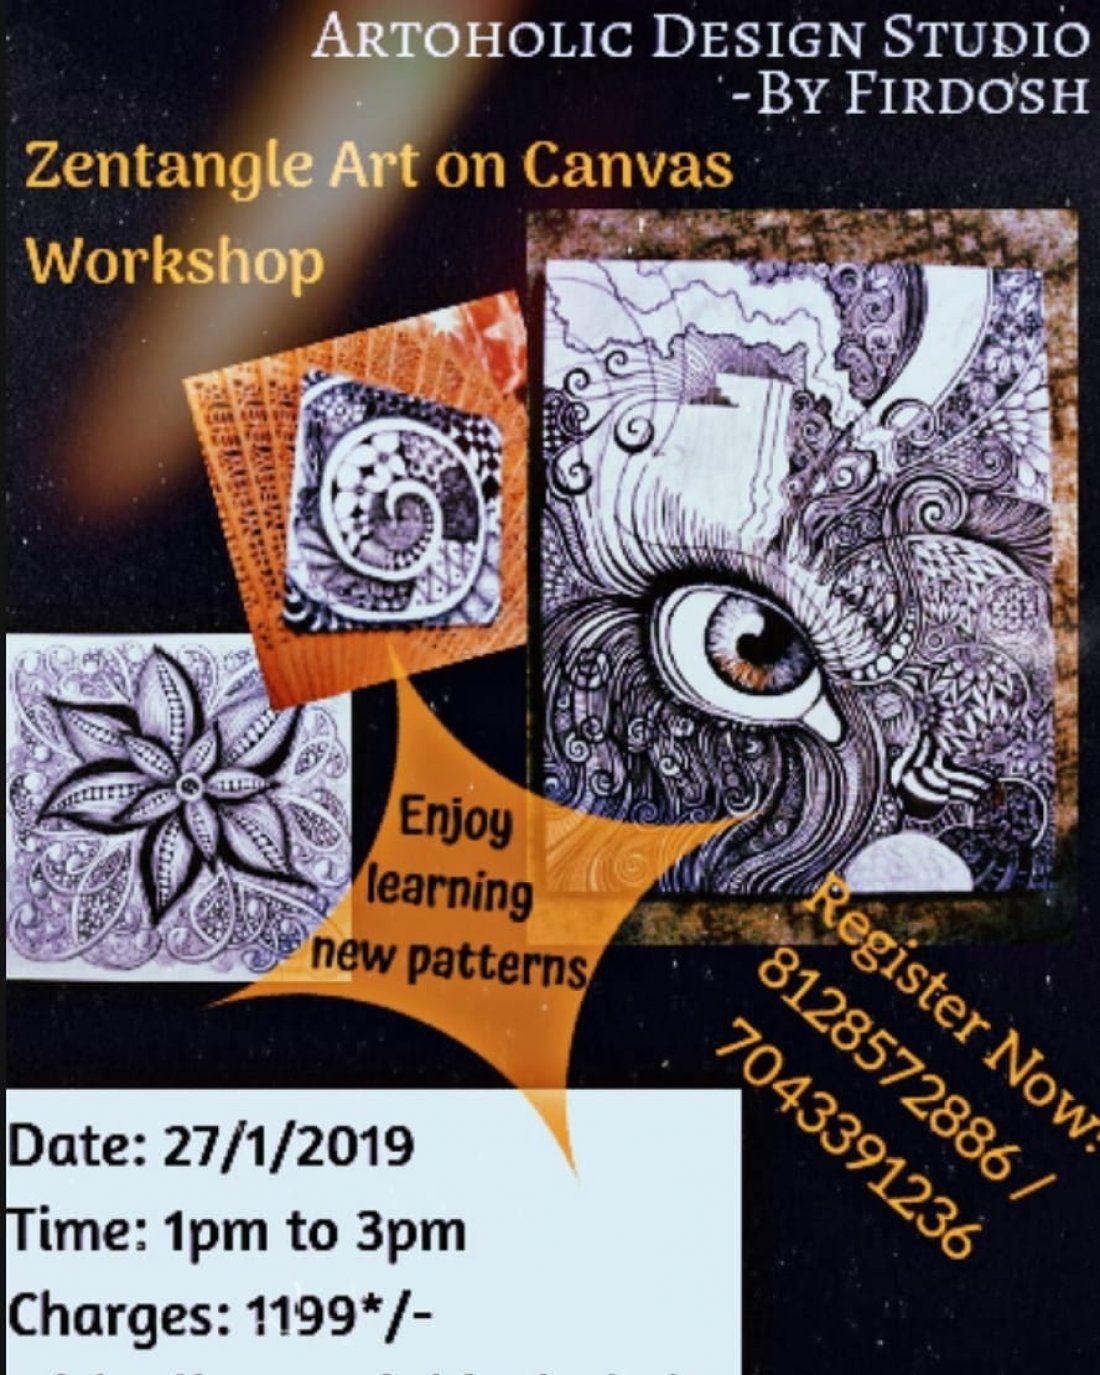 Zentangle Art on Canvas Workshop